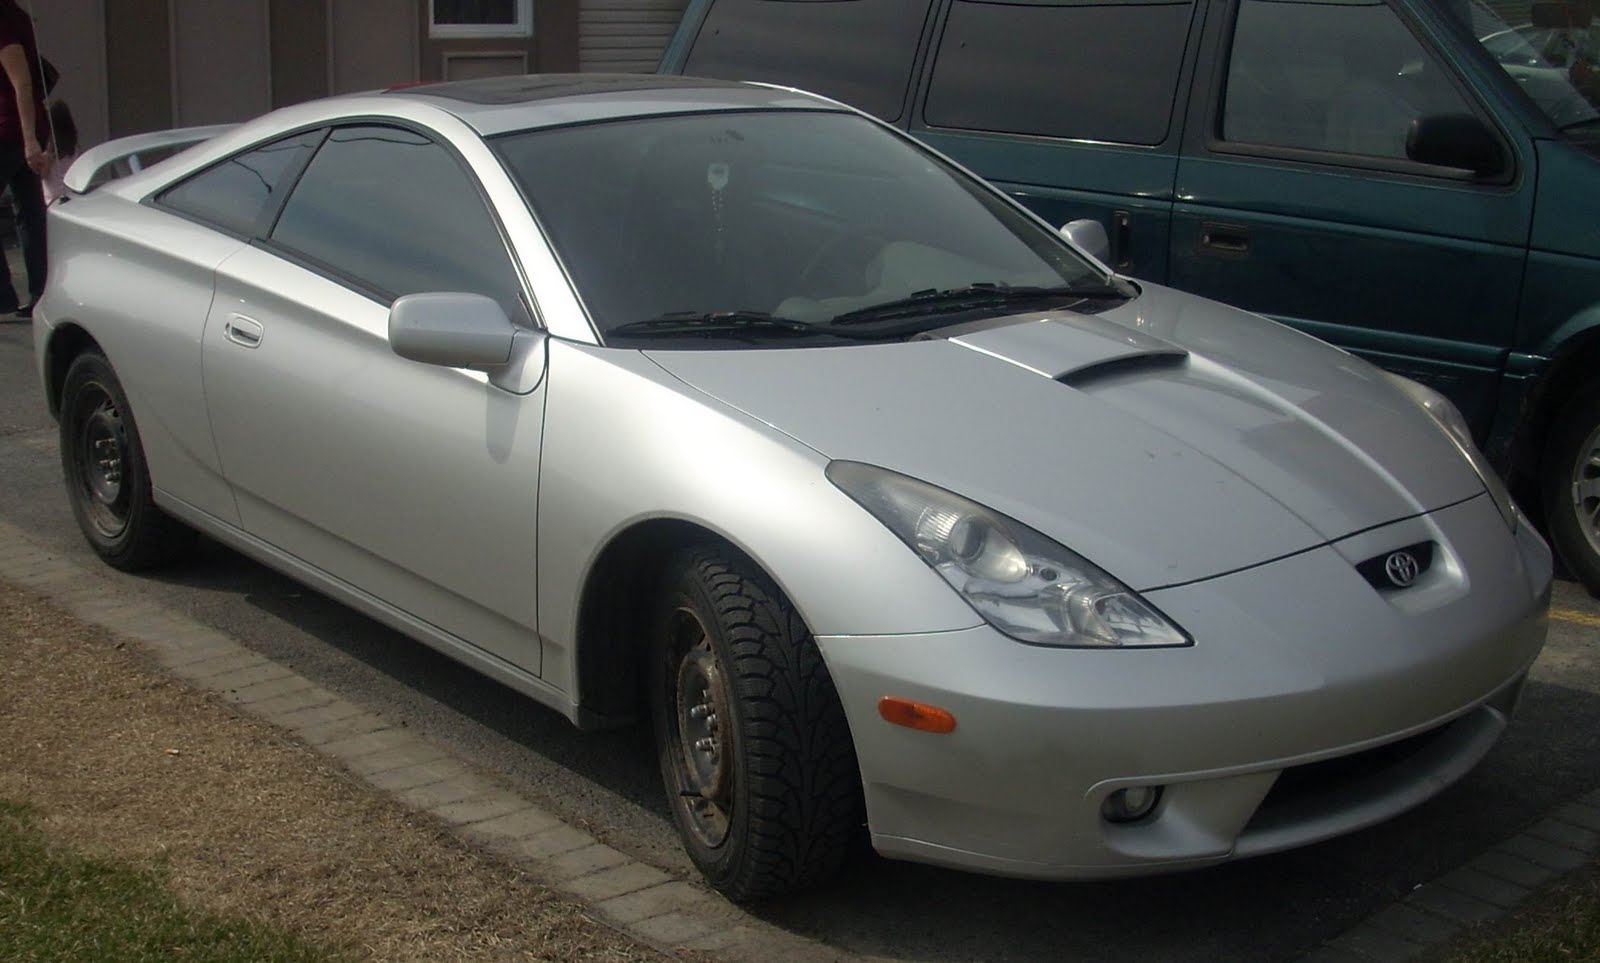 http://1.bp.blogspot.com/-cOop5xu_UHM/Tkw2y8XwxyI/AAAAAAAABZ4/My72noeGJ90/s1600/%252700-%252702_Toyota_Celica_GT-S.JPG